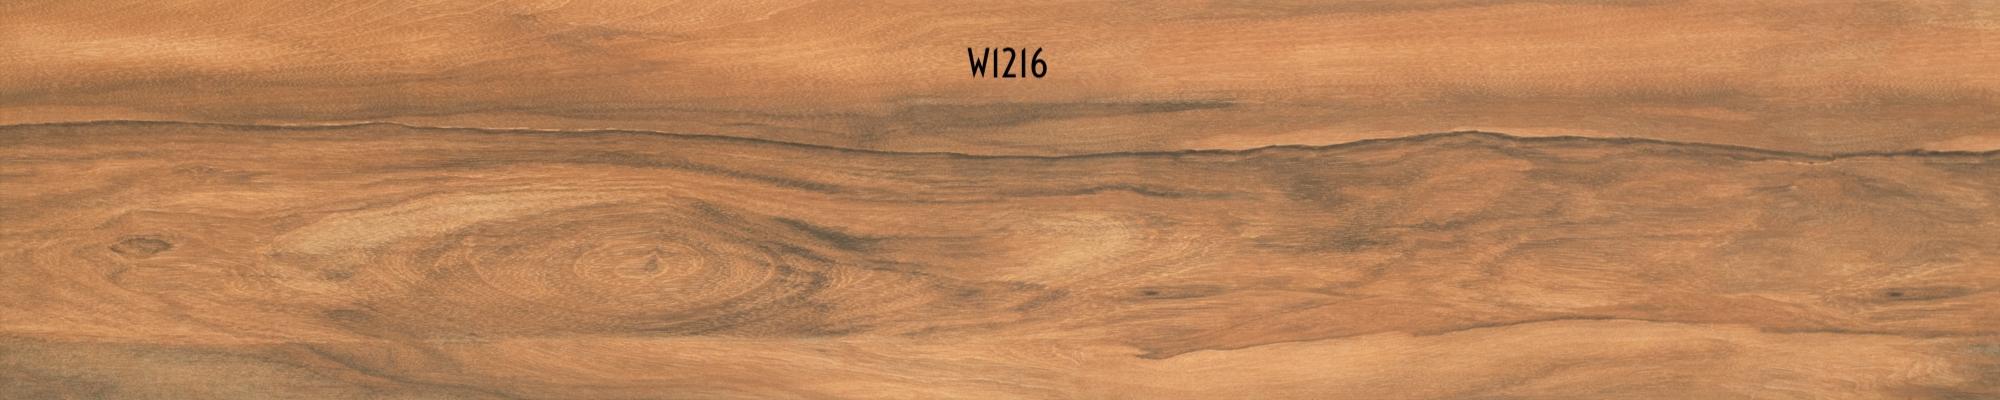 W1216